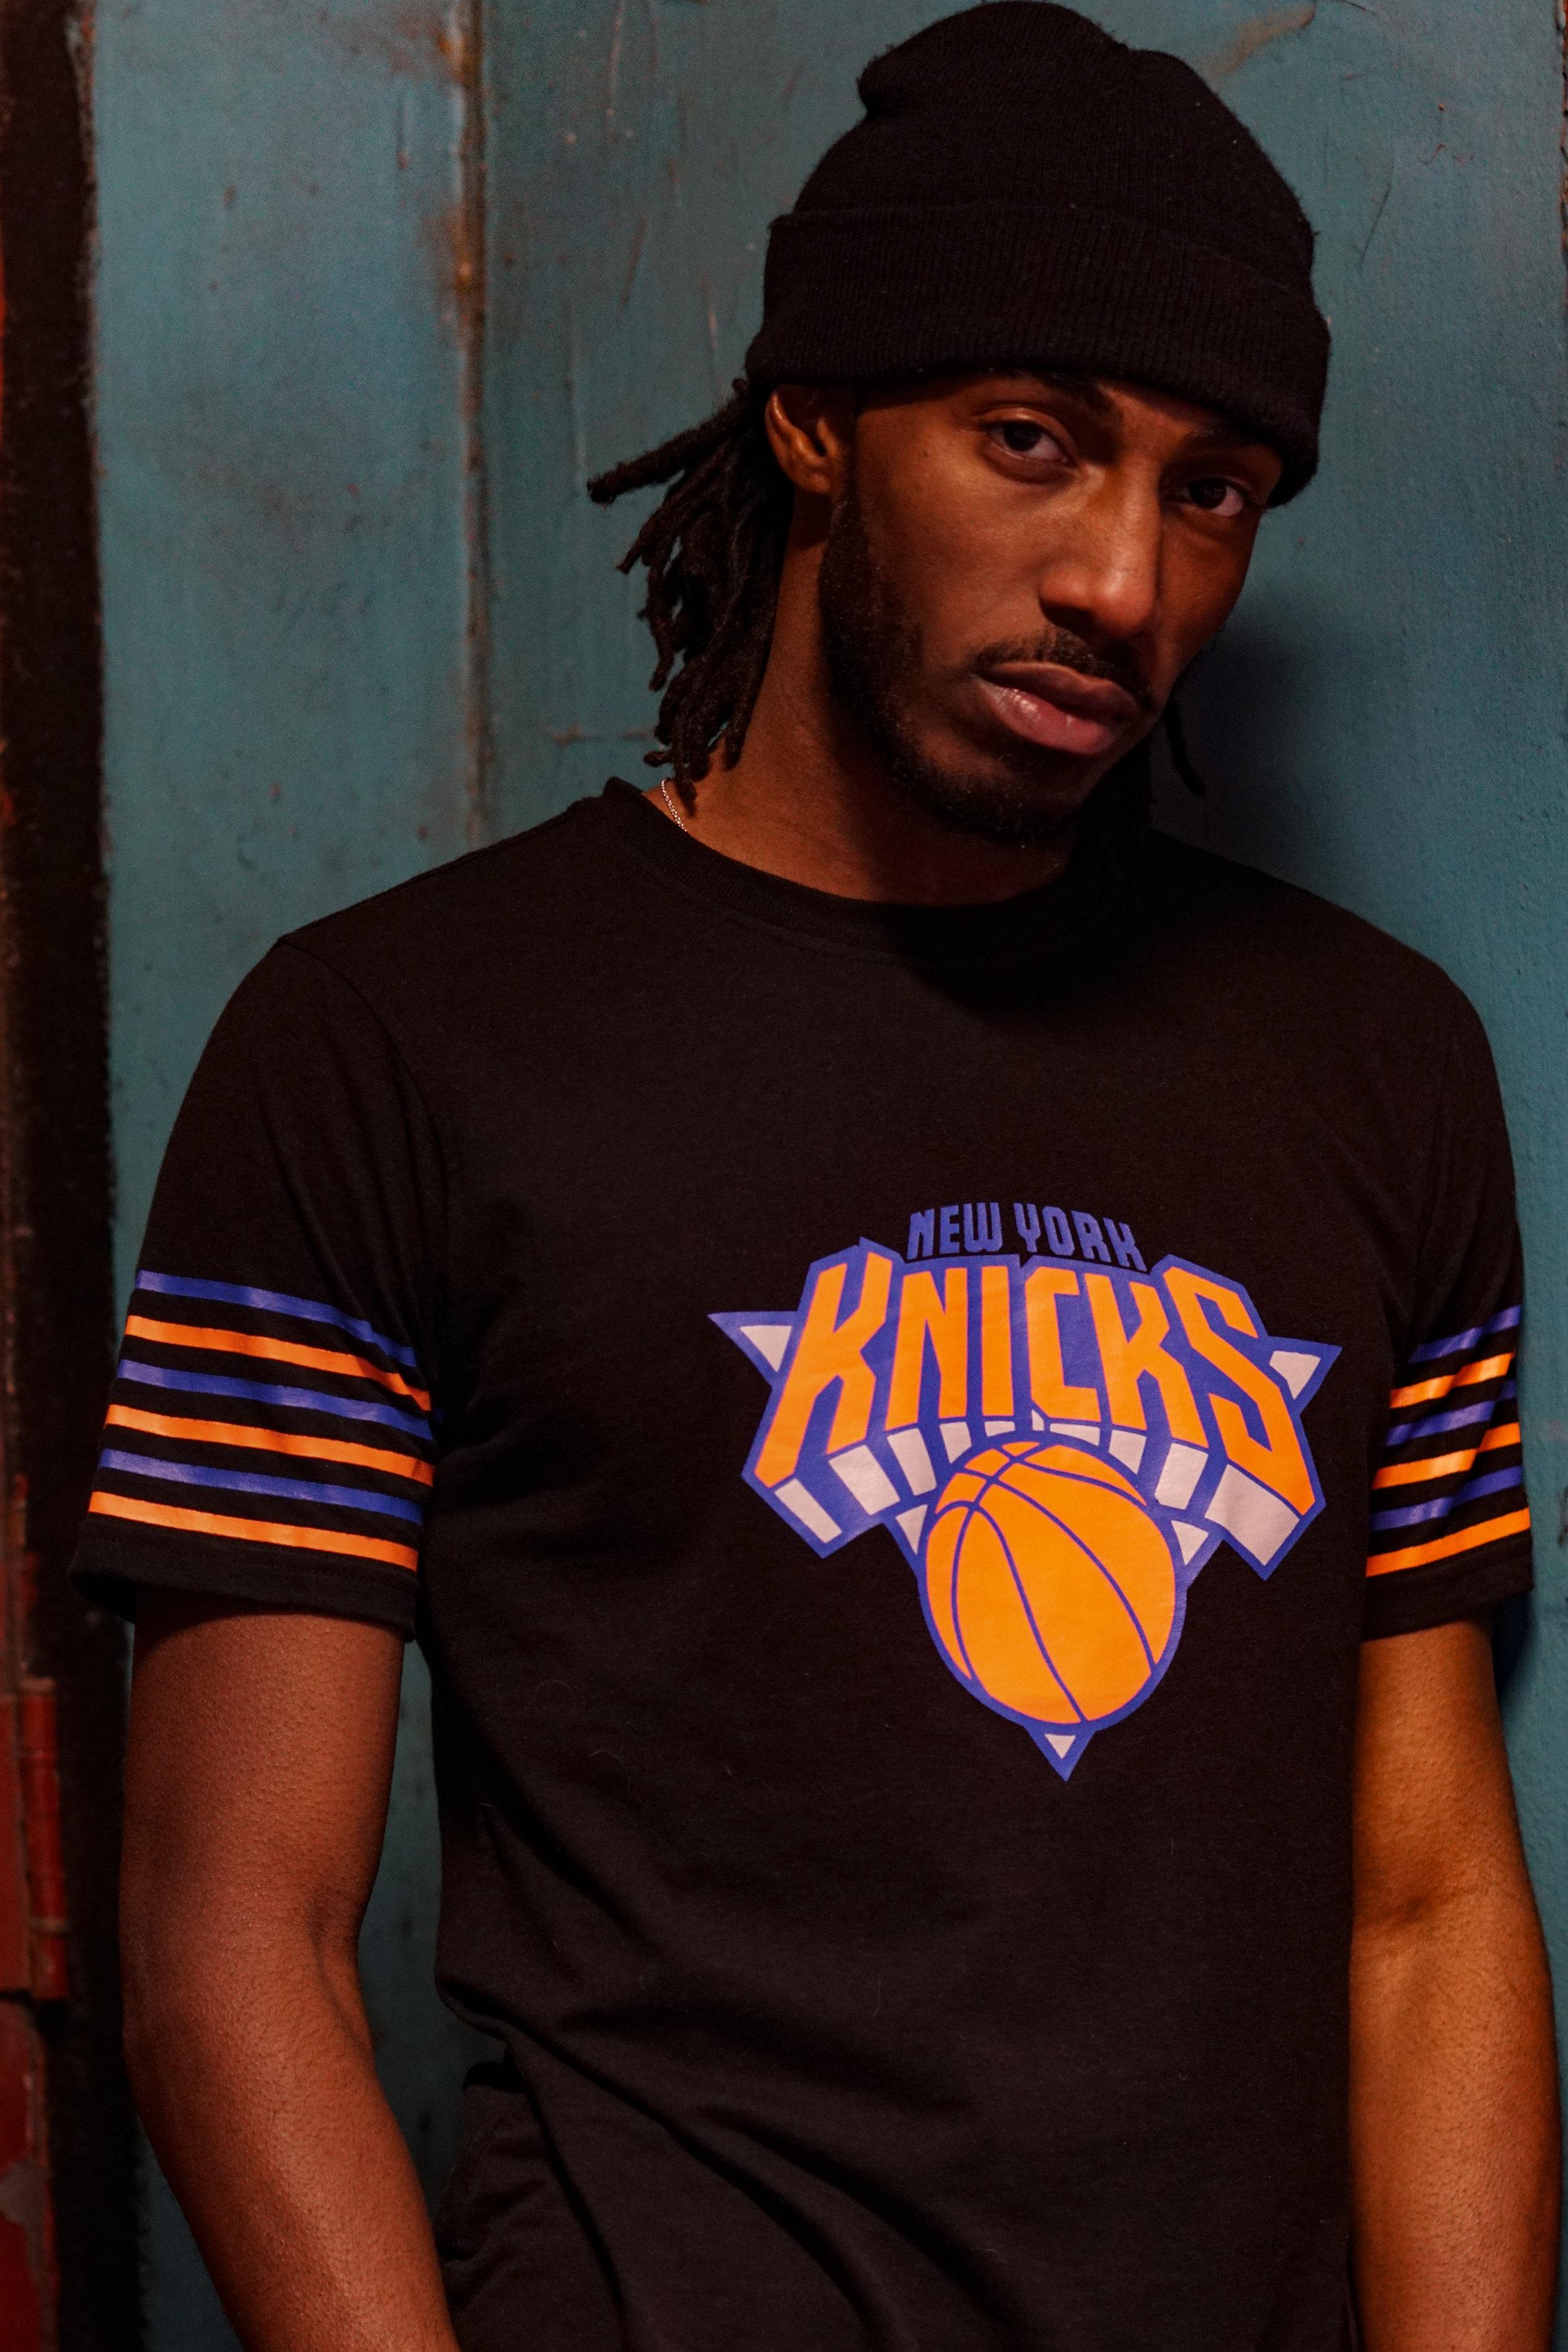 Grungy Gentleman x NY Knicks 7.jpg